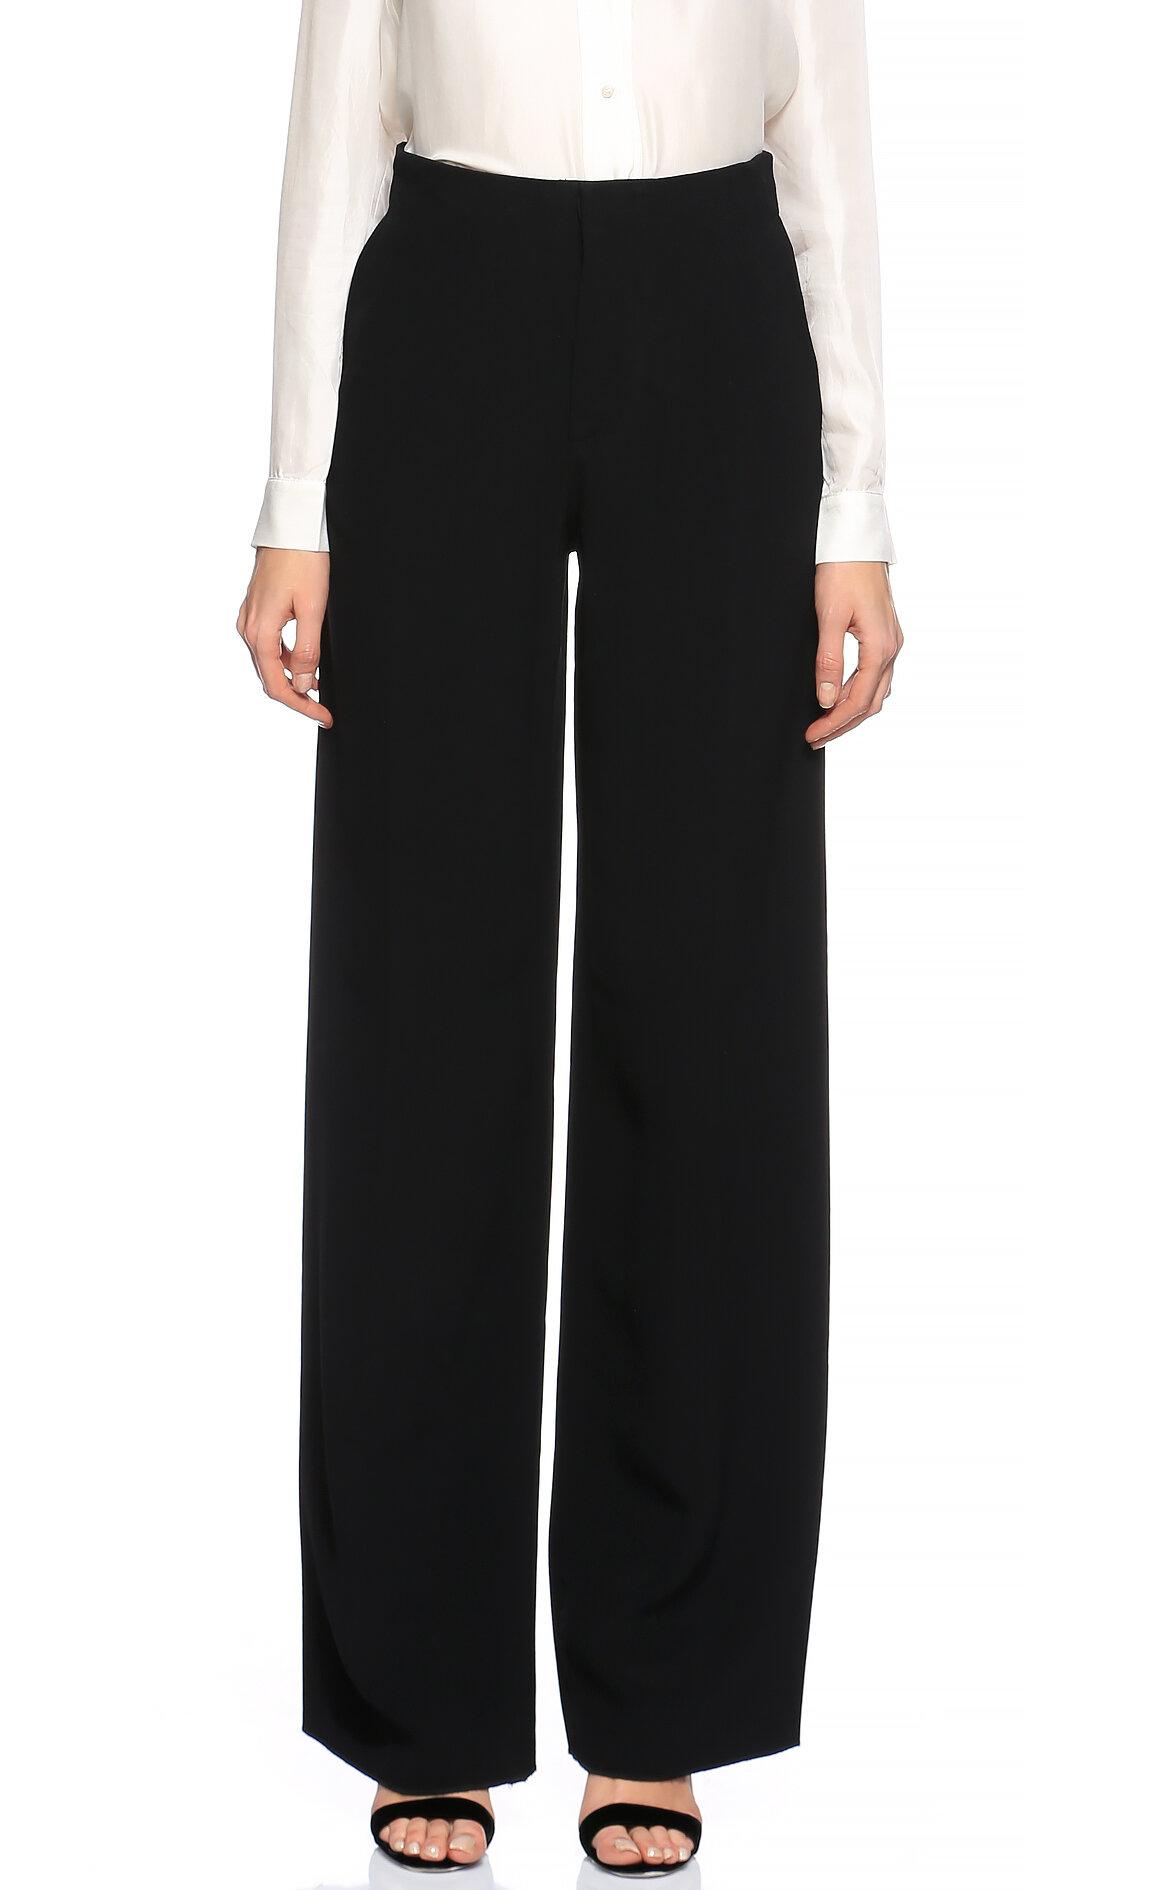 Victoria Beckham-Victoria Beckham Siyah Pantolon